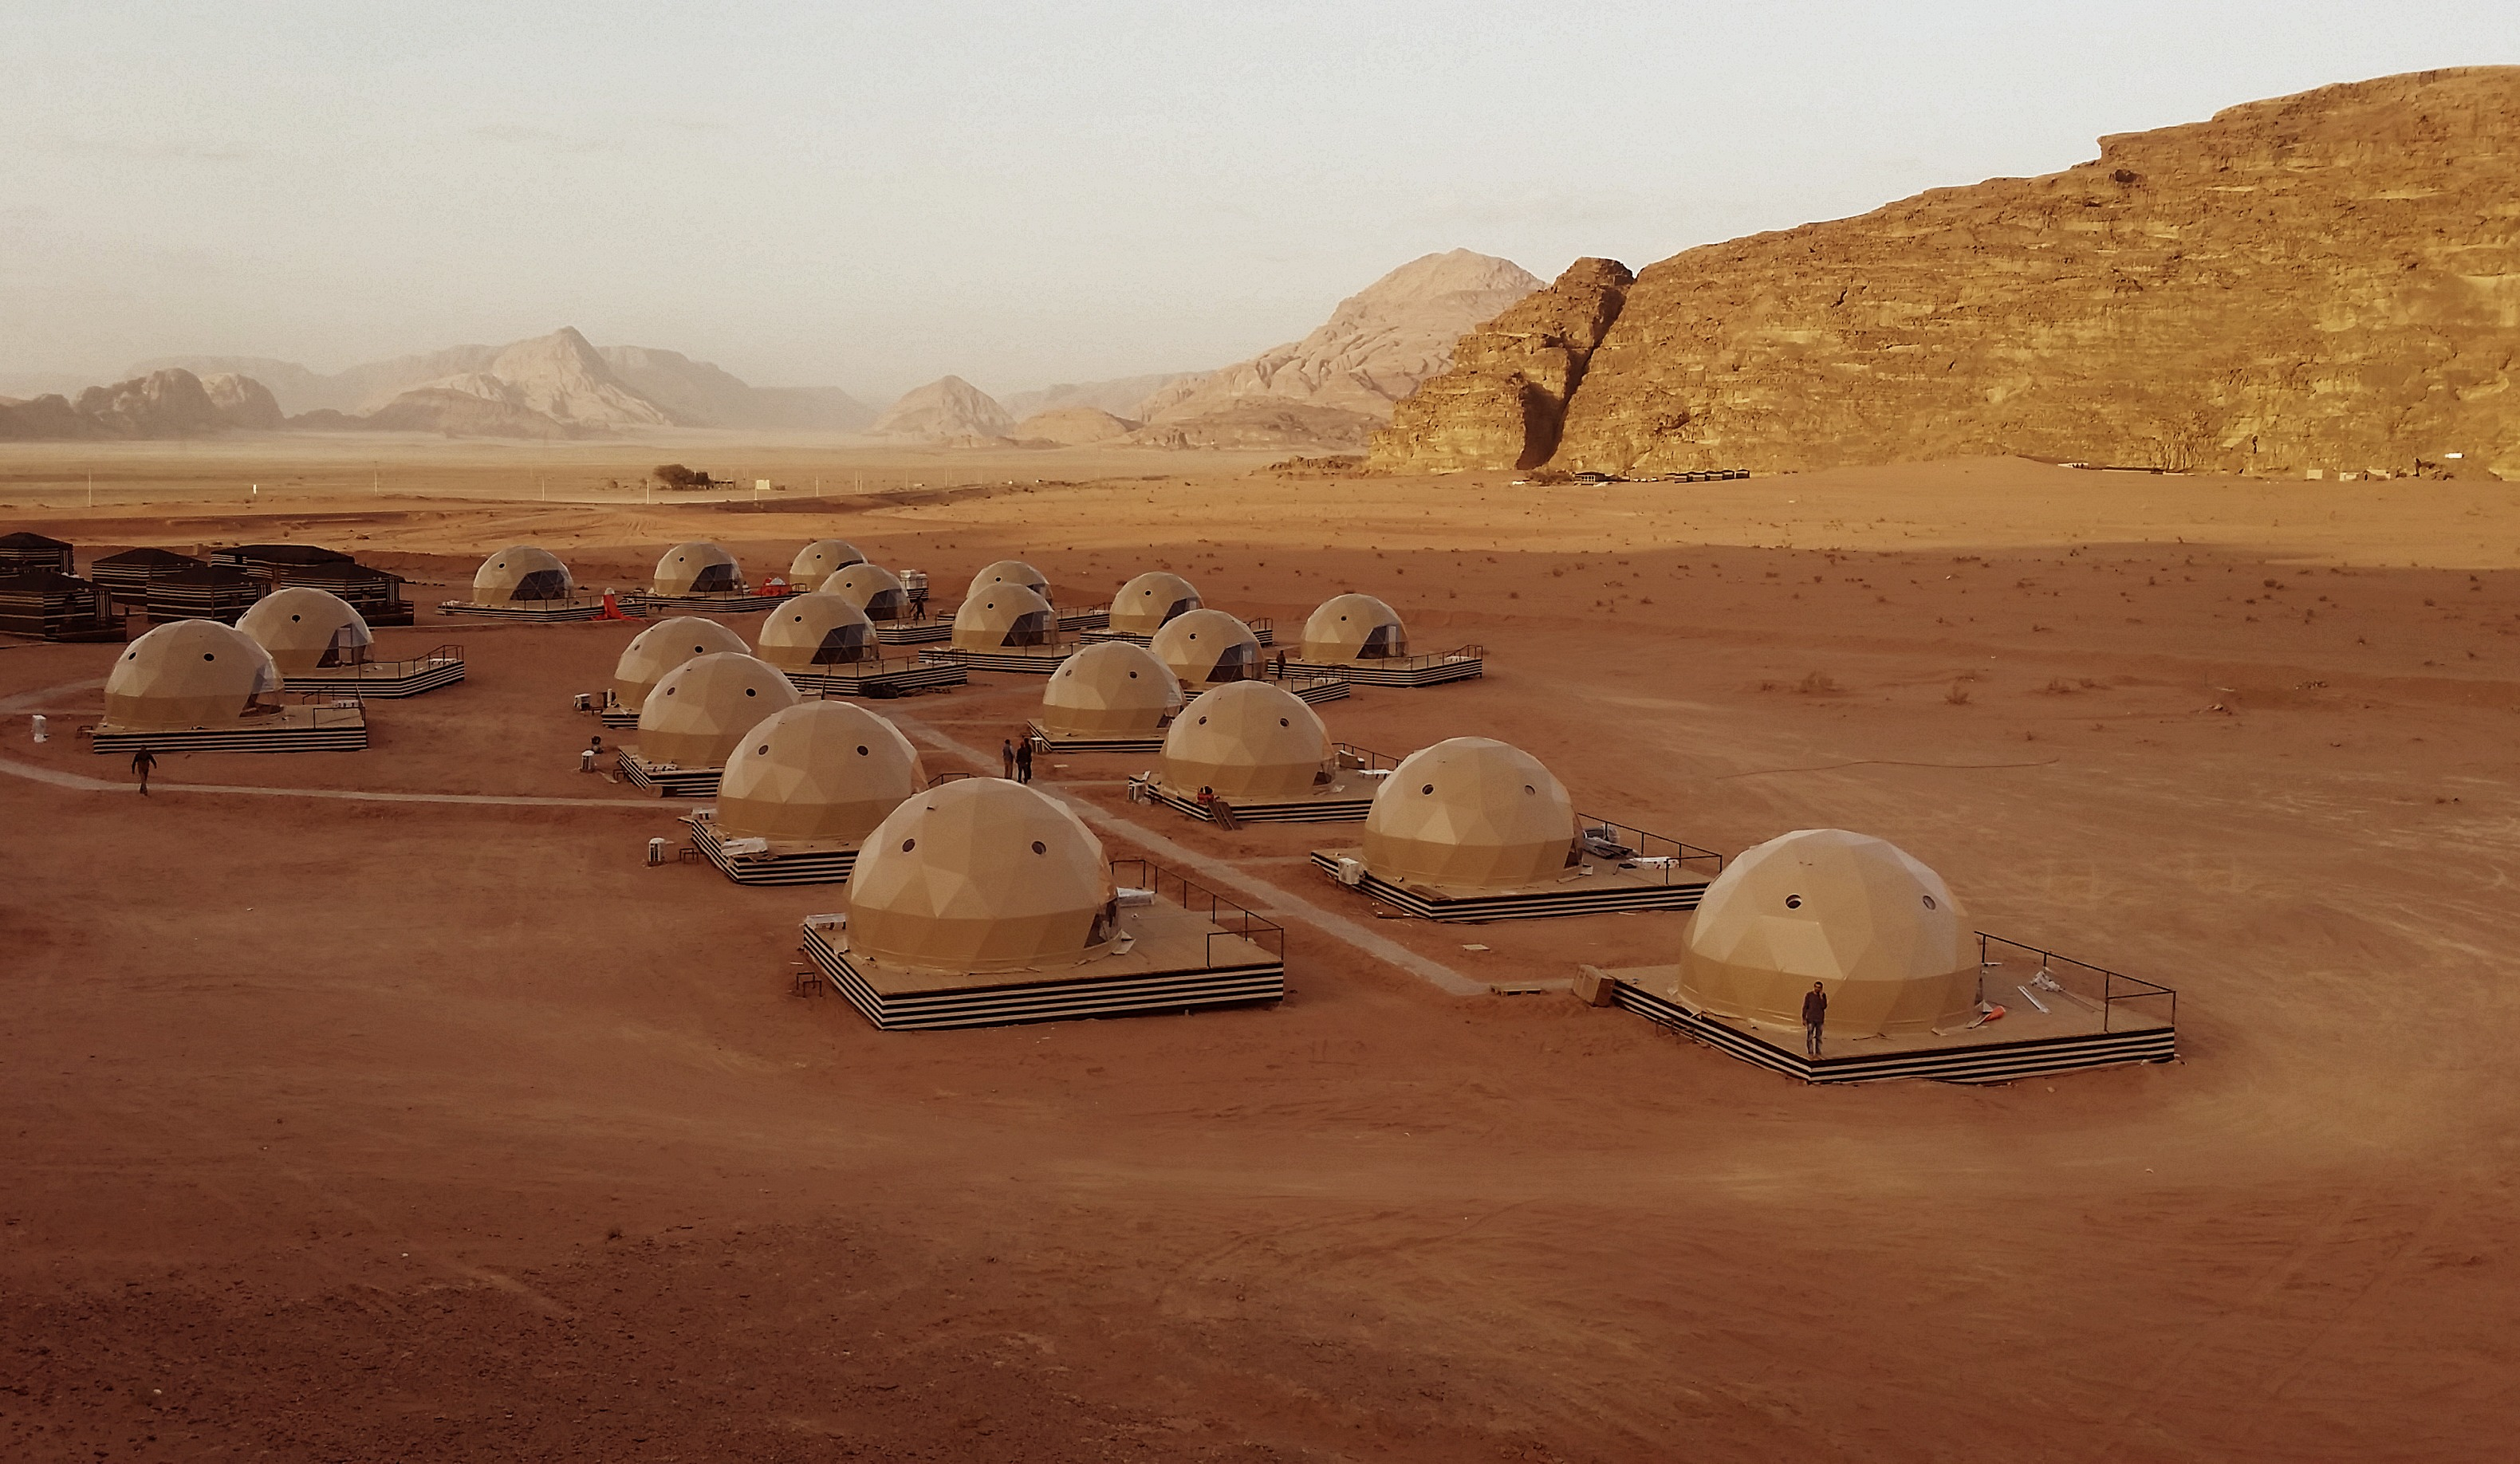 Martian glamping in the desert at Sun City Jordan